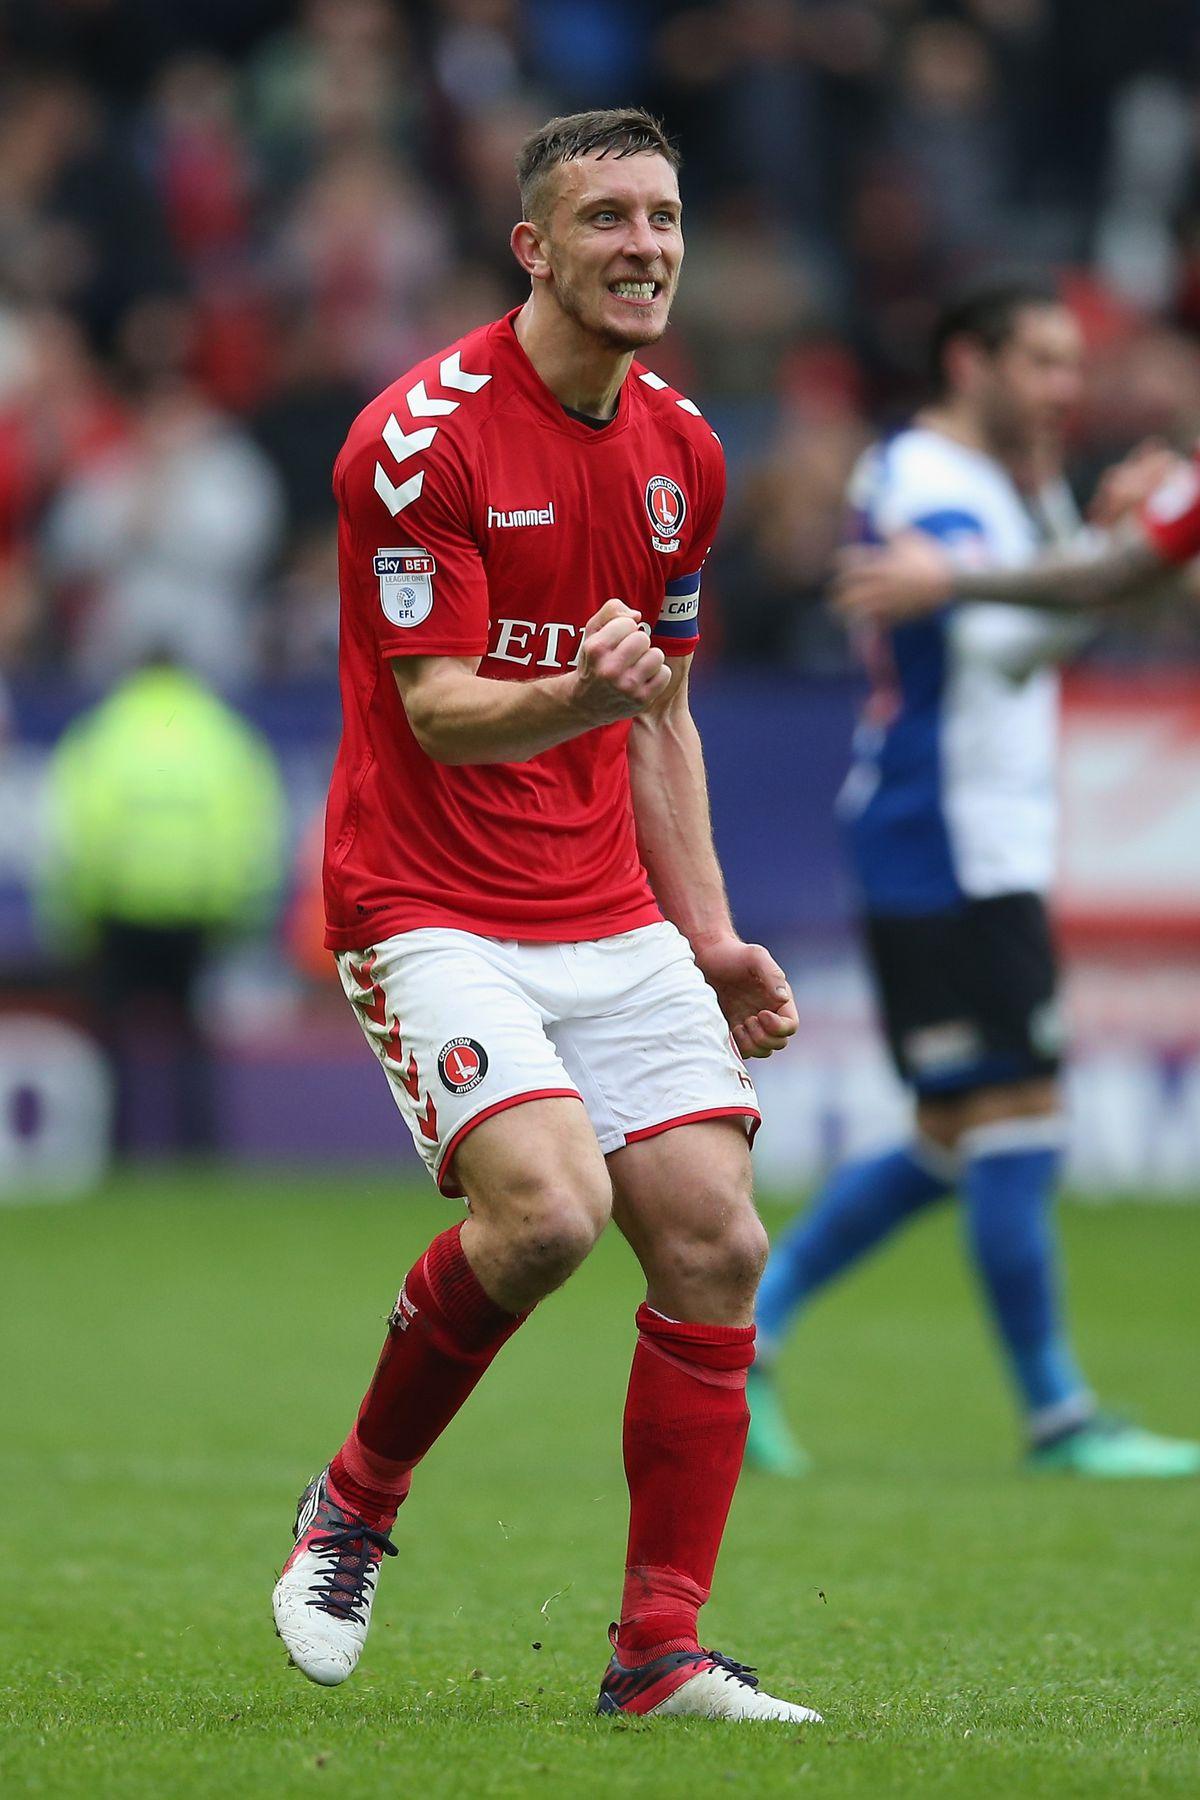 Charlton Athletic v Blackburn Rovers - Sky Bet League One